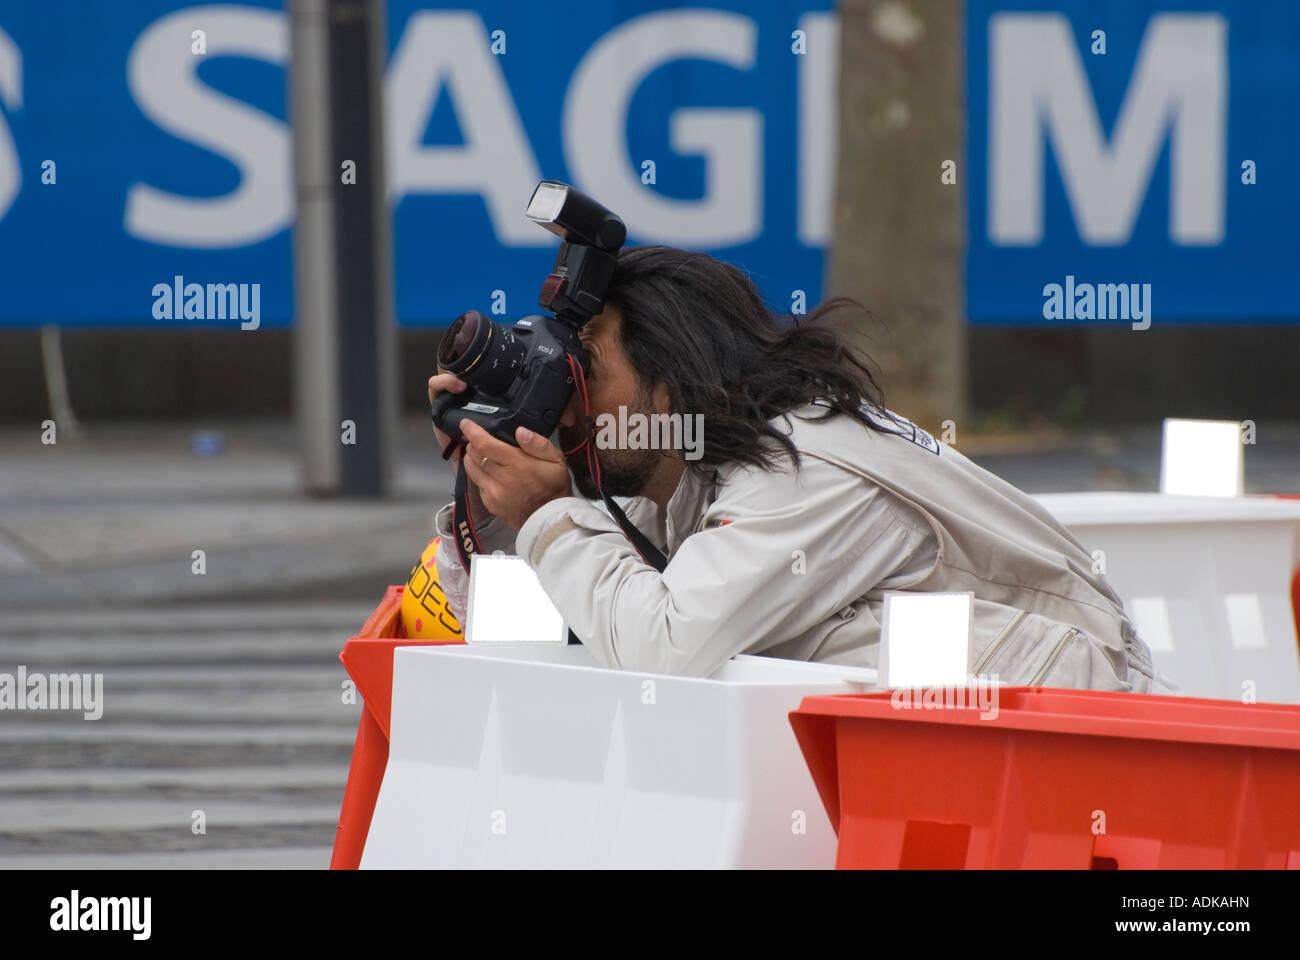 professional sports photographer in Paris at the Tour de France 2007 - Stock Image